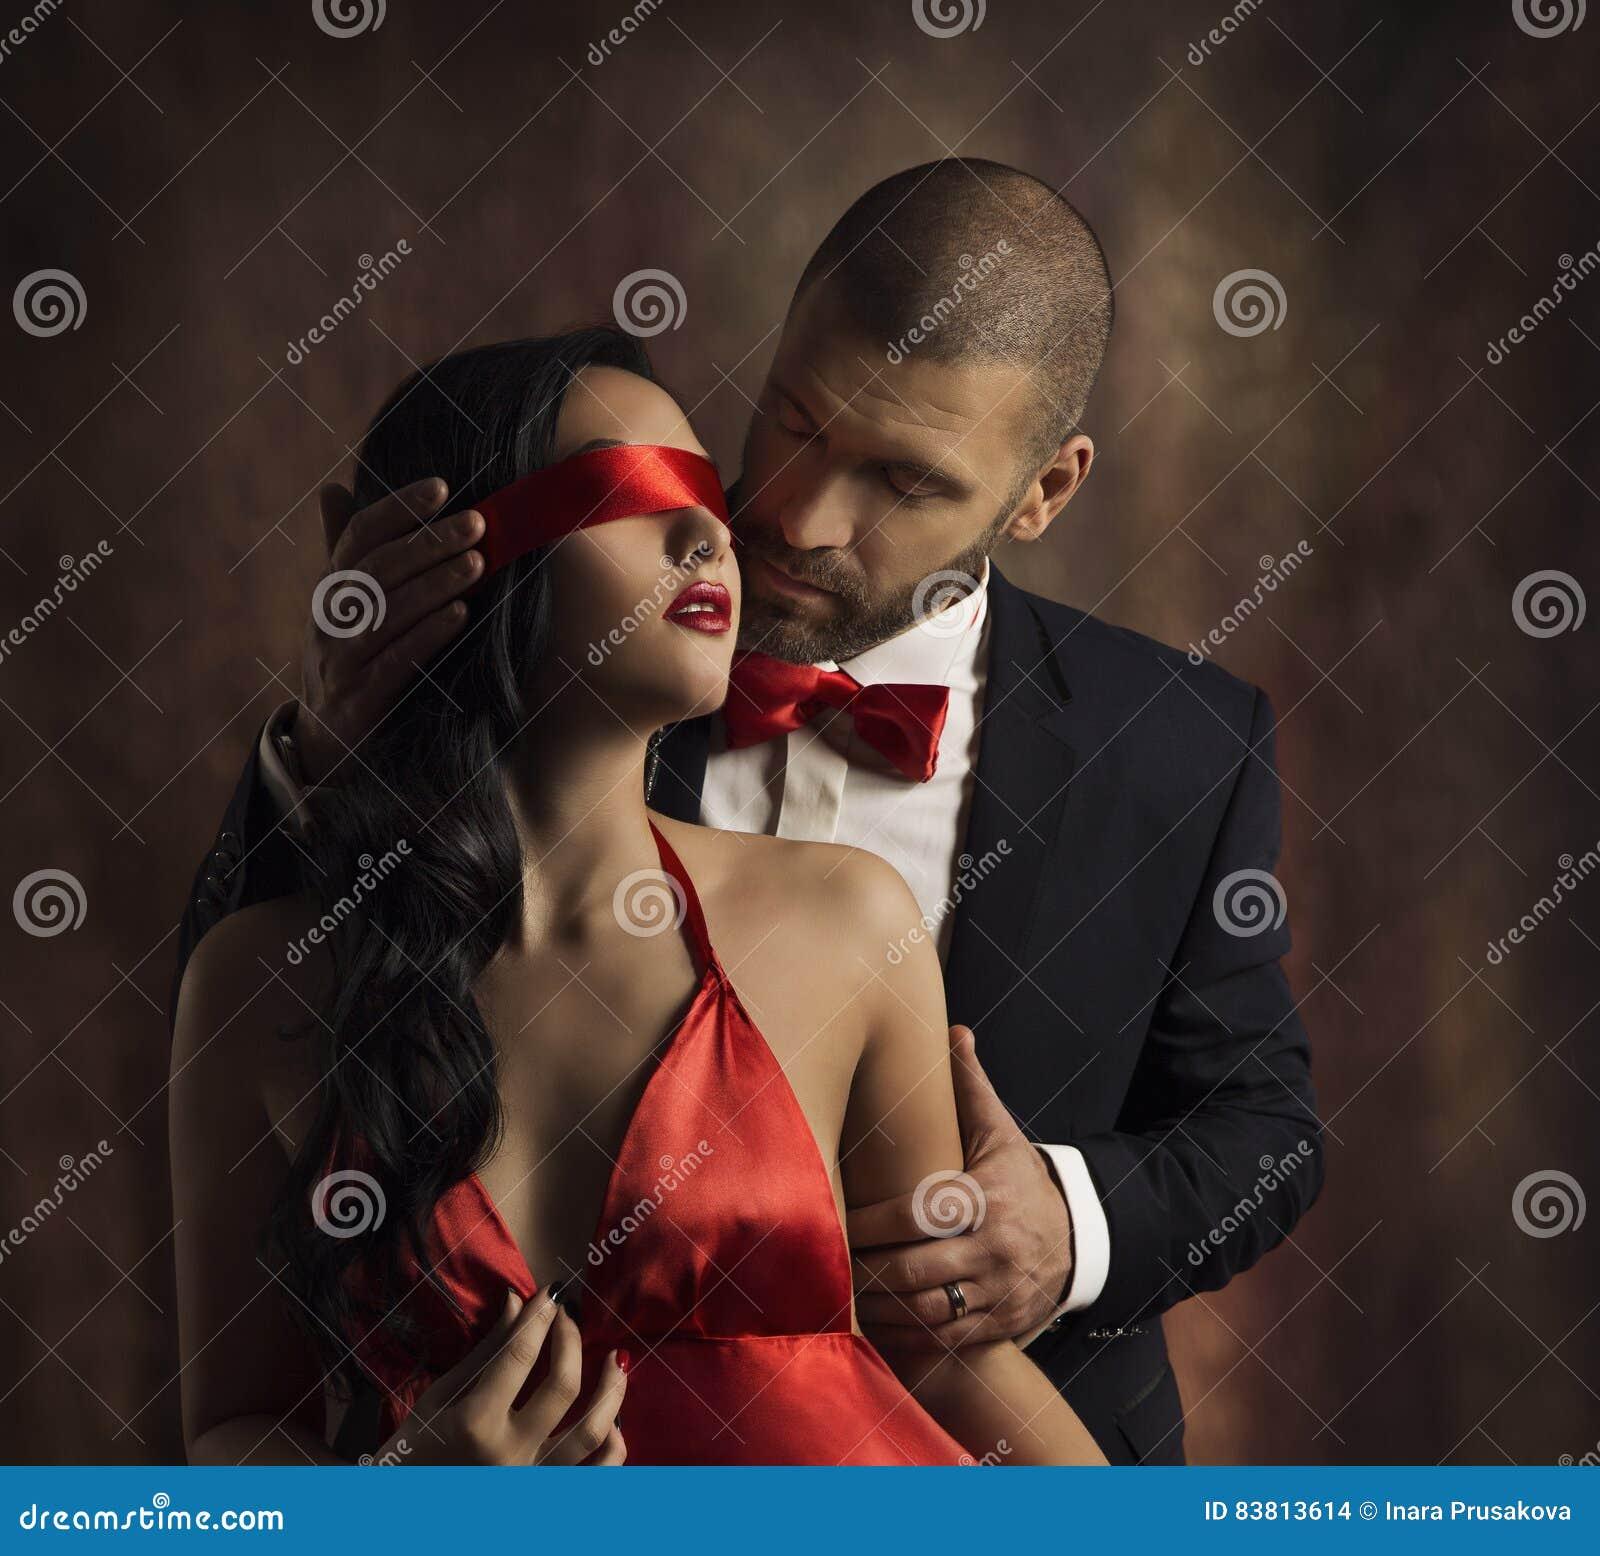 Www amour baiser le sexe